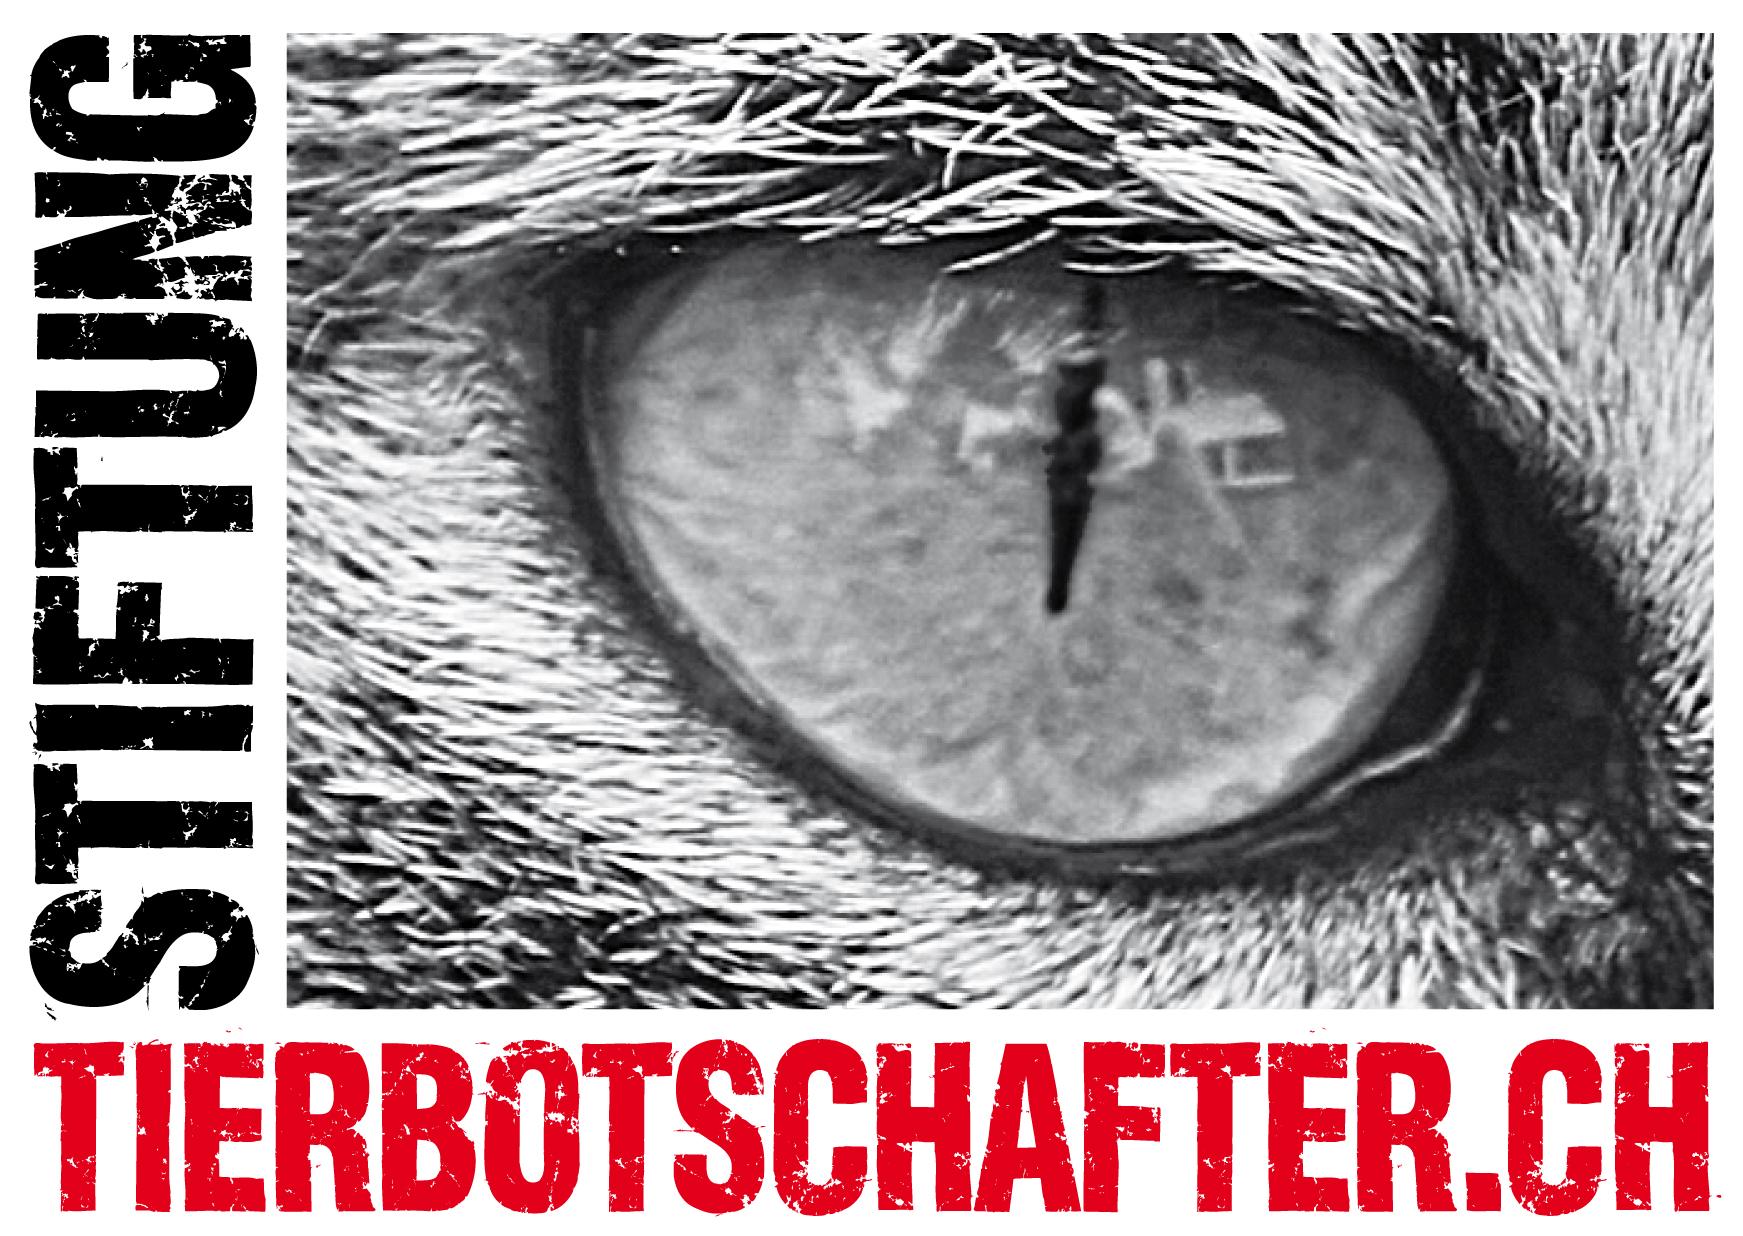 Tierbotschafter.ch